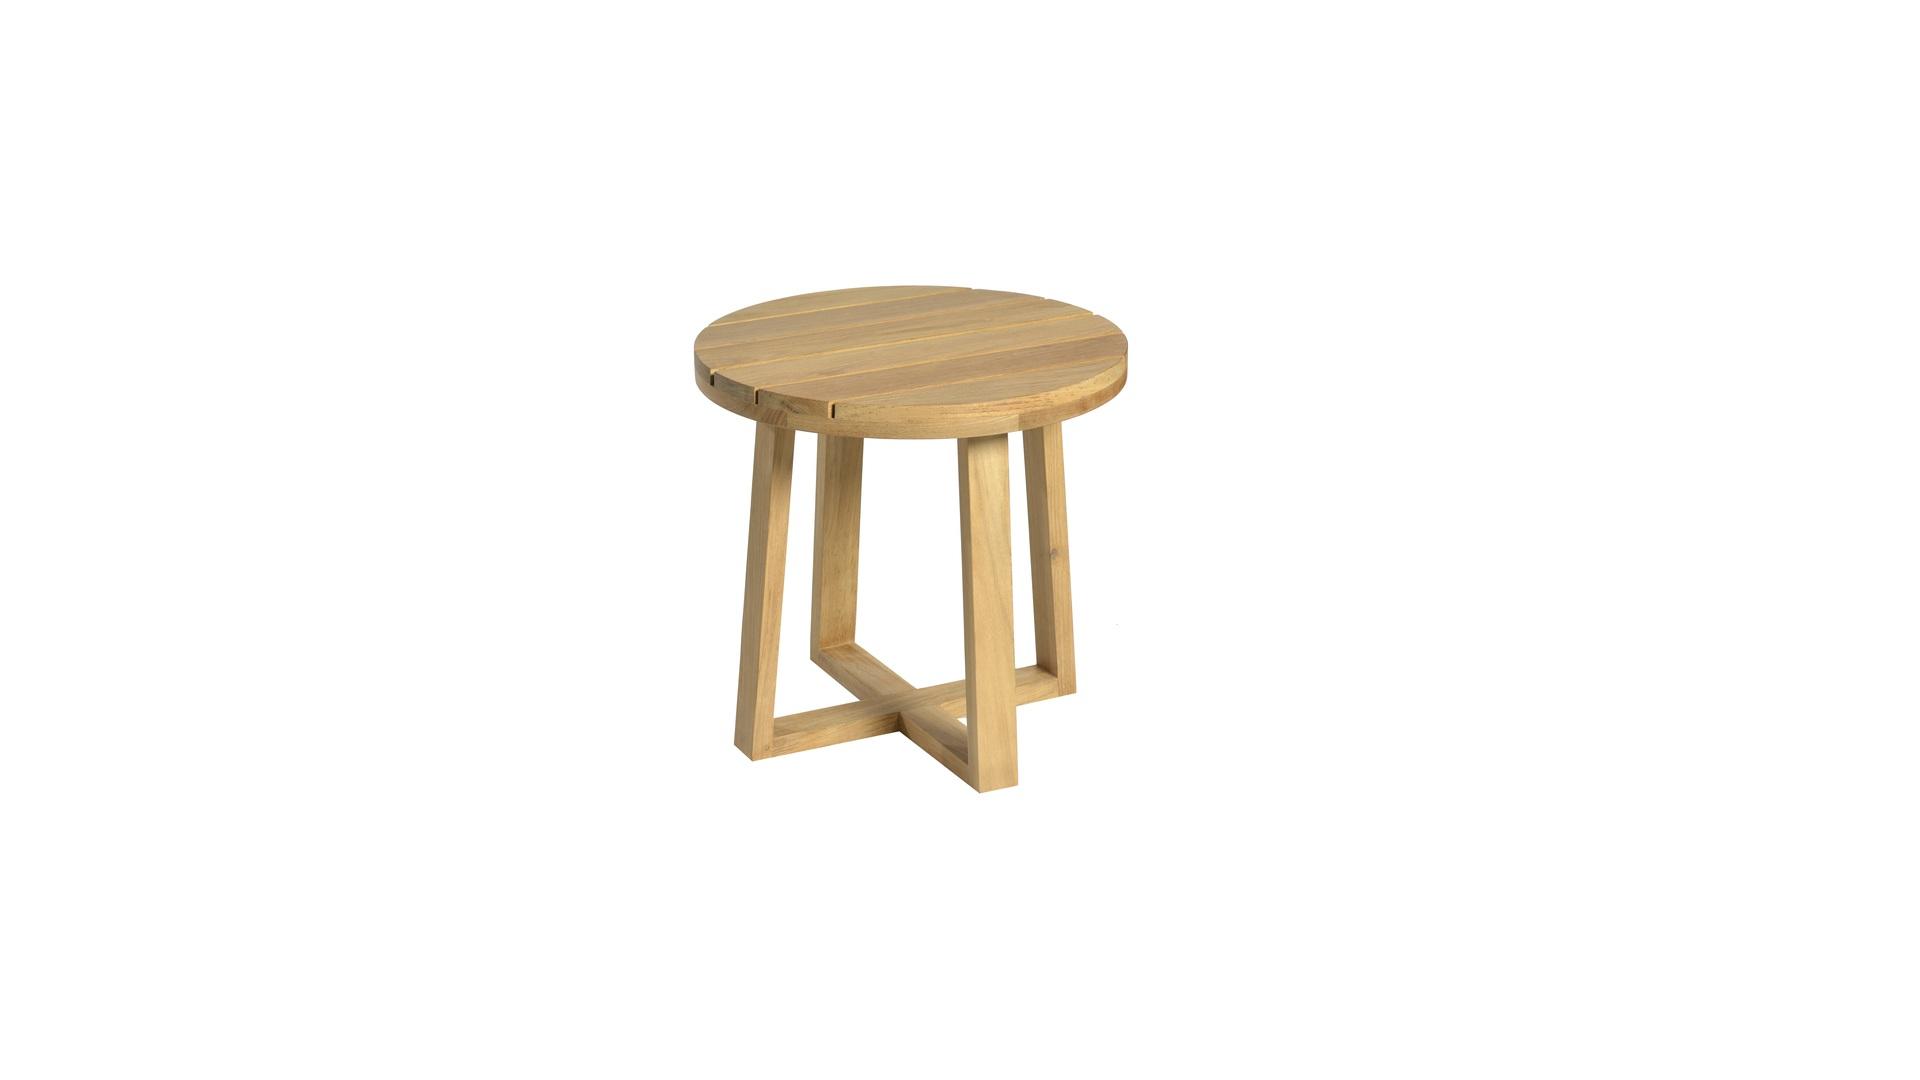 2020 Borek teak Lazise side table Ø46x46 7364 2.jpg